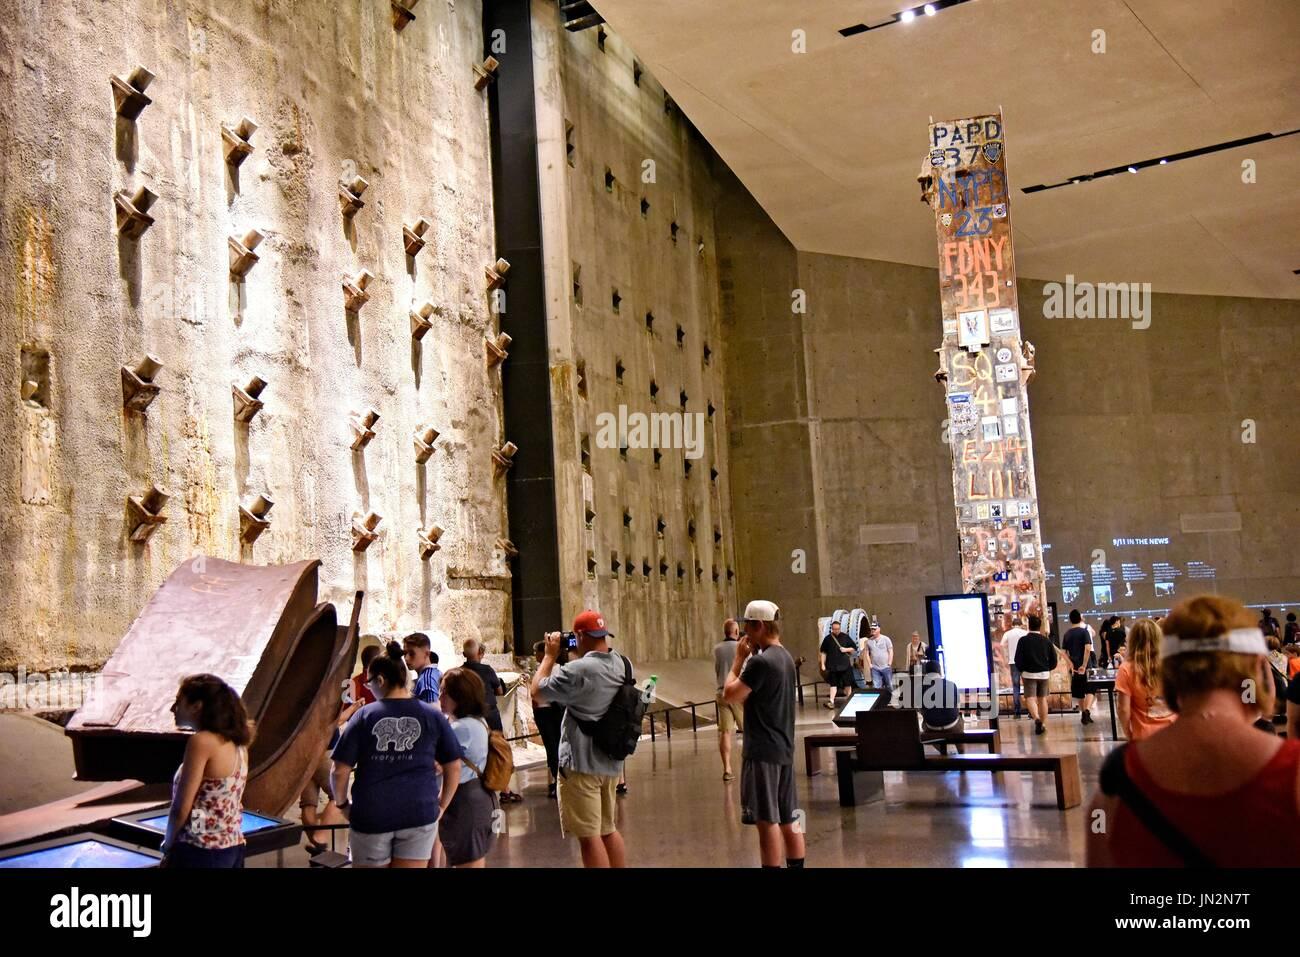 USA NY New York City Manhattan The National September 11 Memorial & Museum - Stock Image